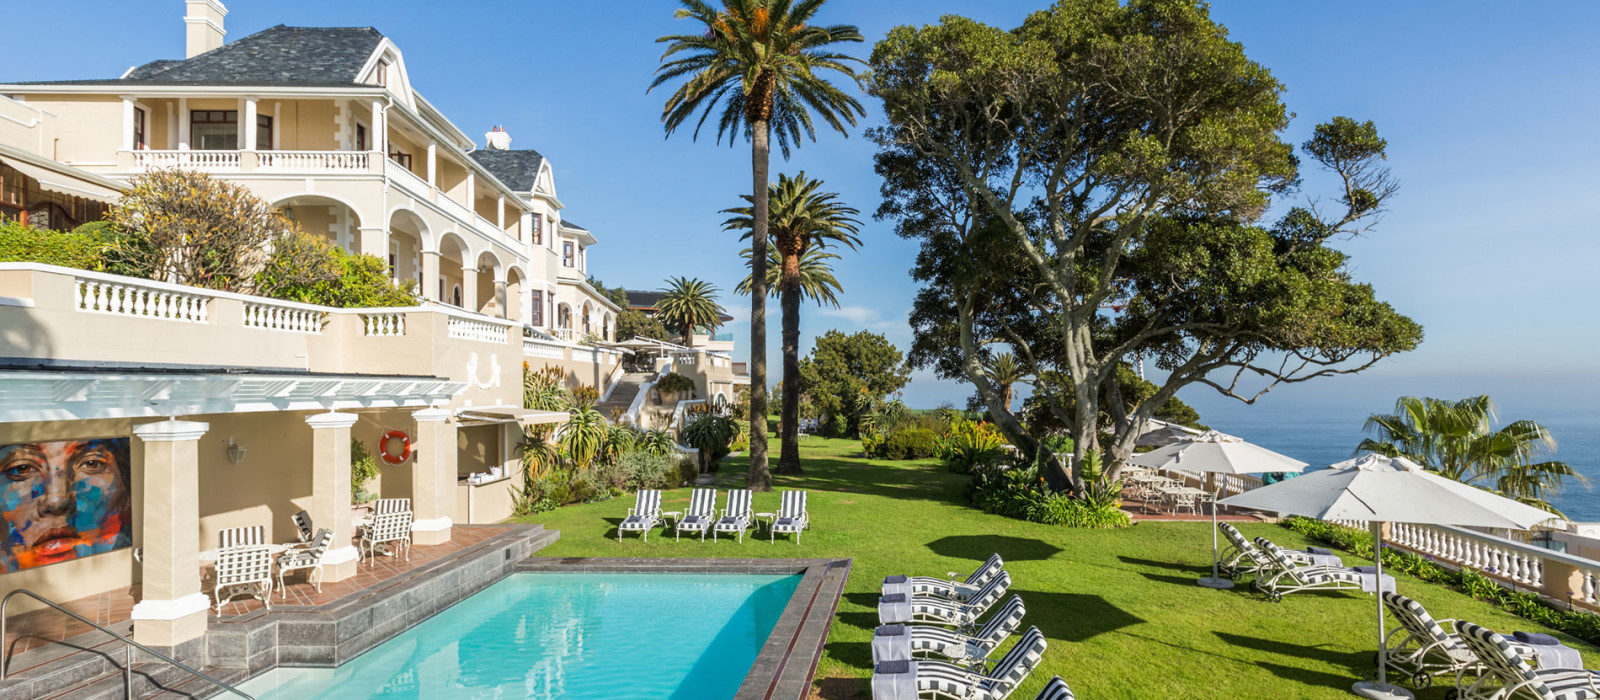 Hotel Ellerman House South Africa